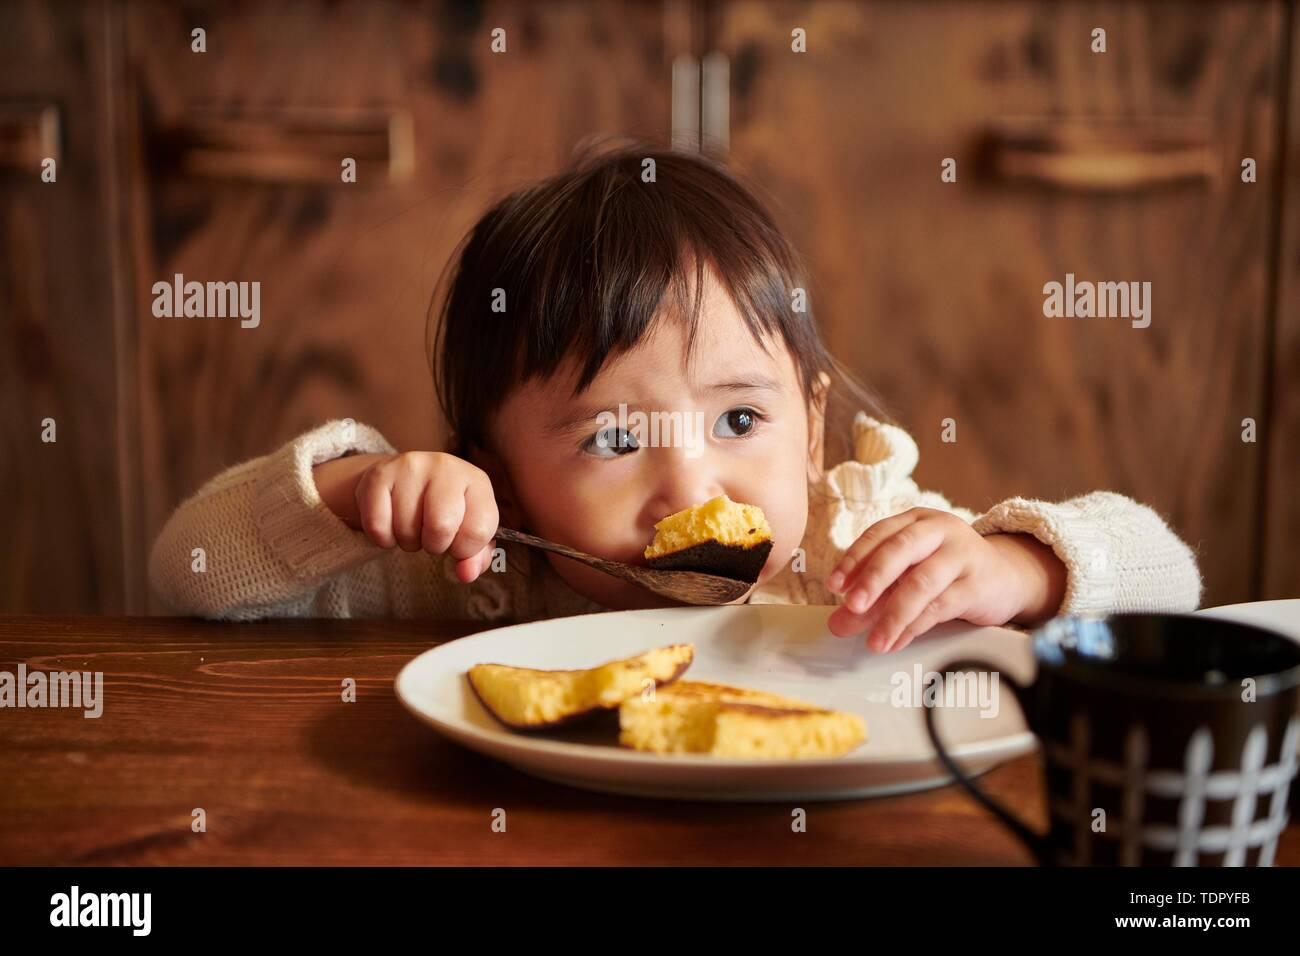 Japanese kid at home - Stock Image